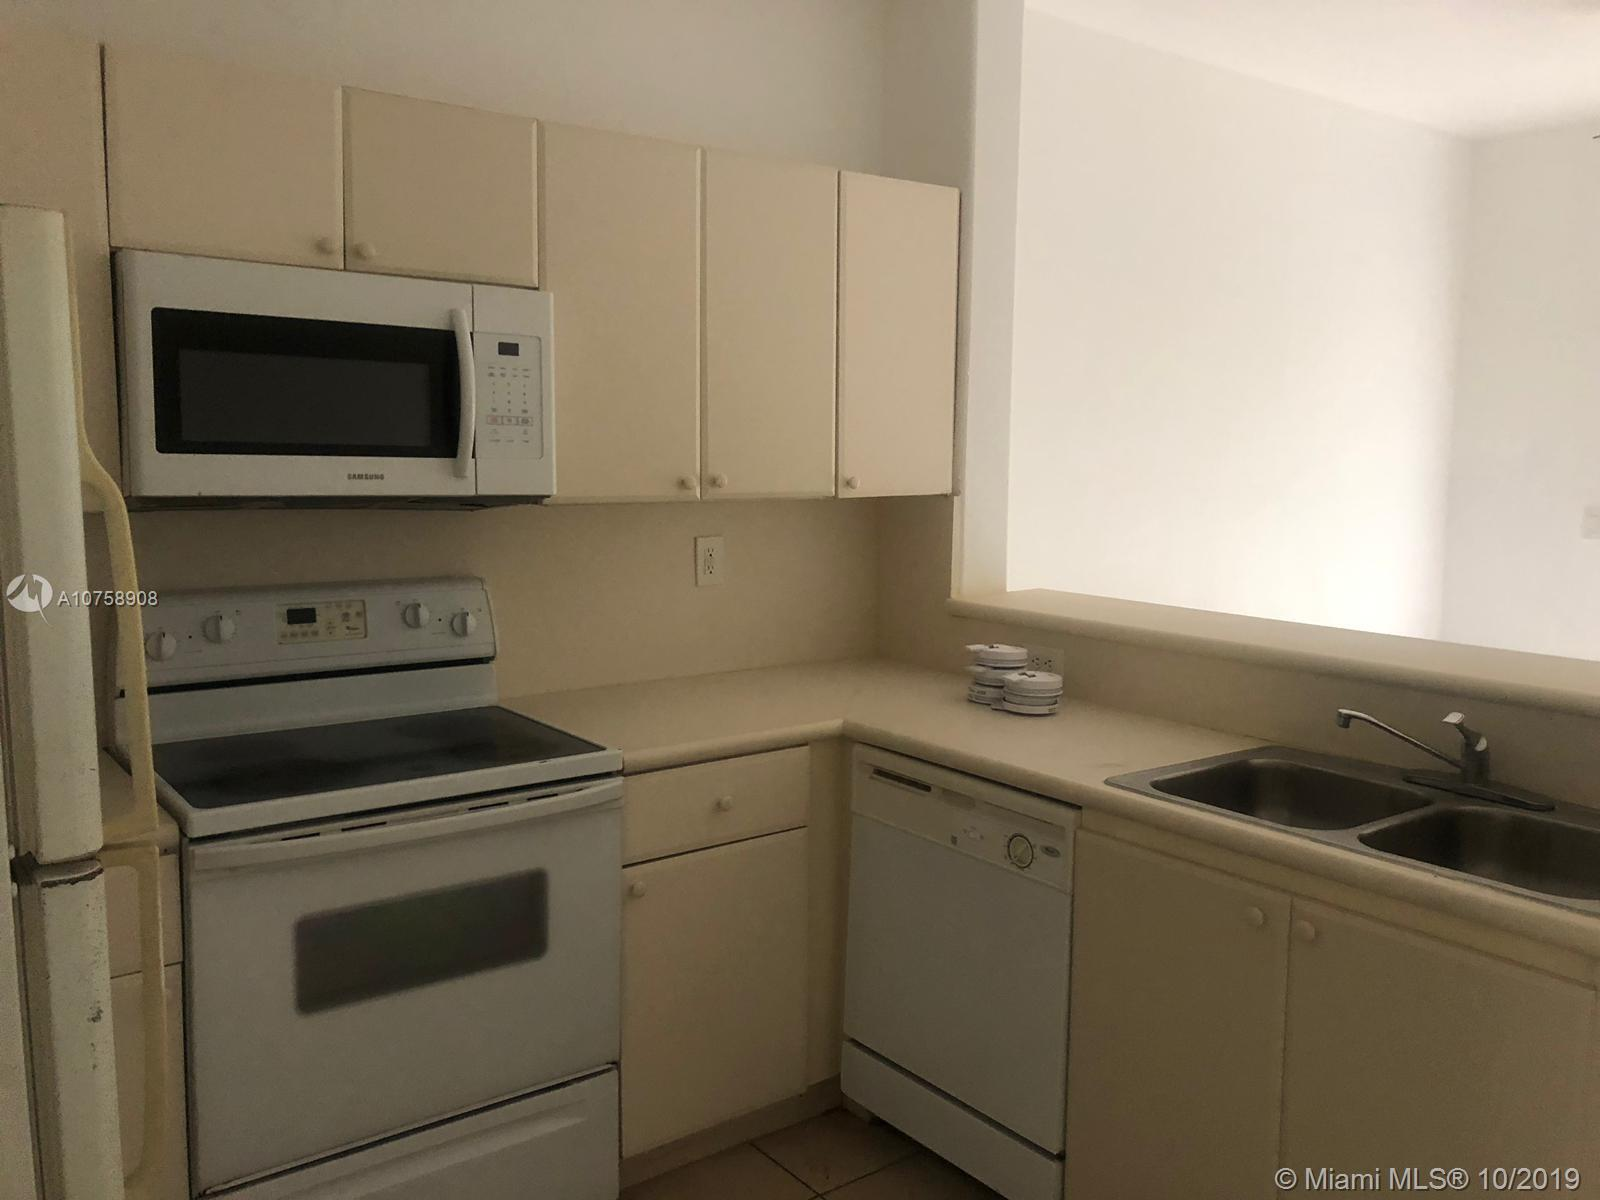 1692 29th Ct #100, Homestead, FL 33035 - Homestead, FL real estate listing